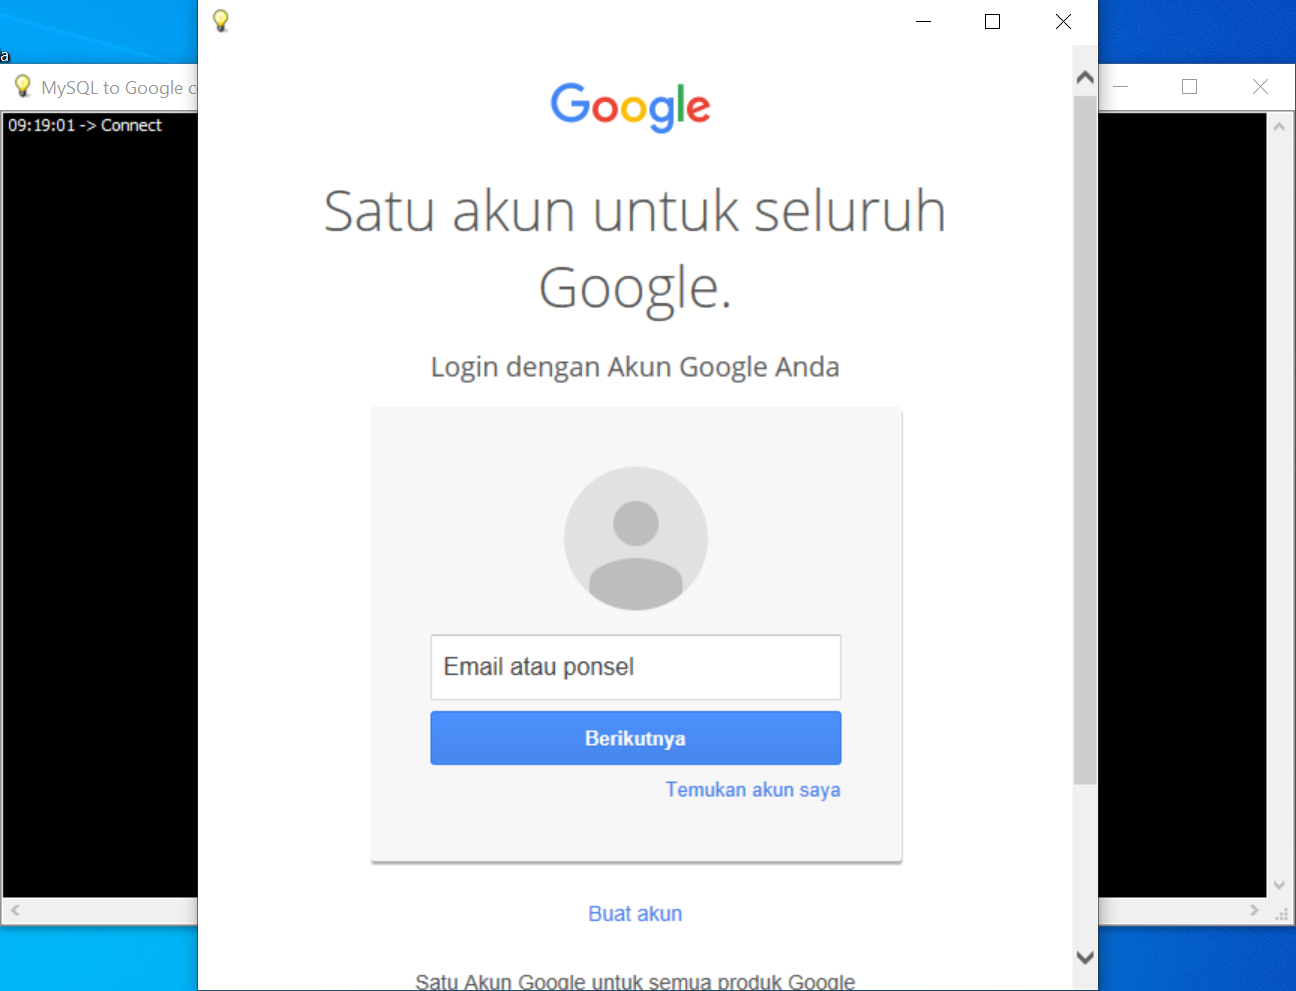 Integrasi MySQL ke Google Contacts